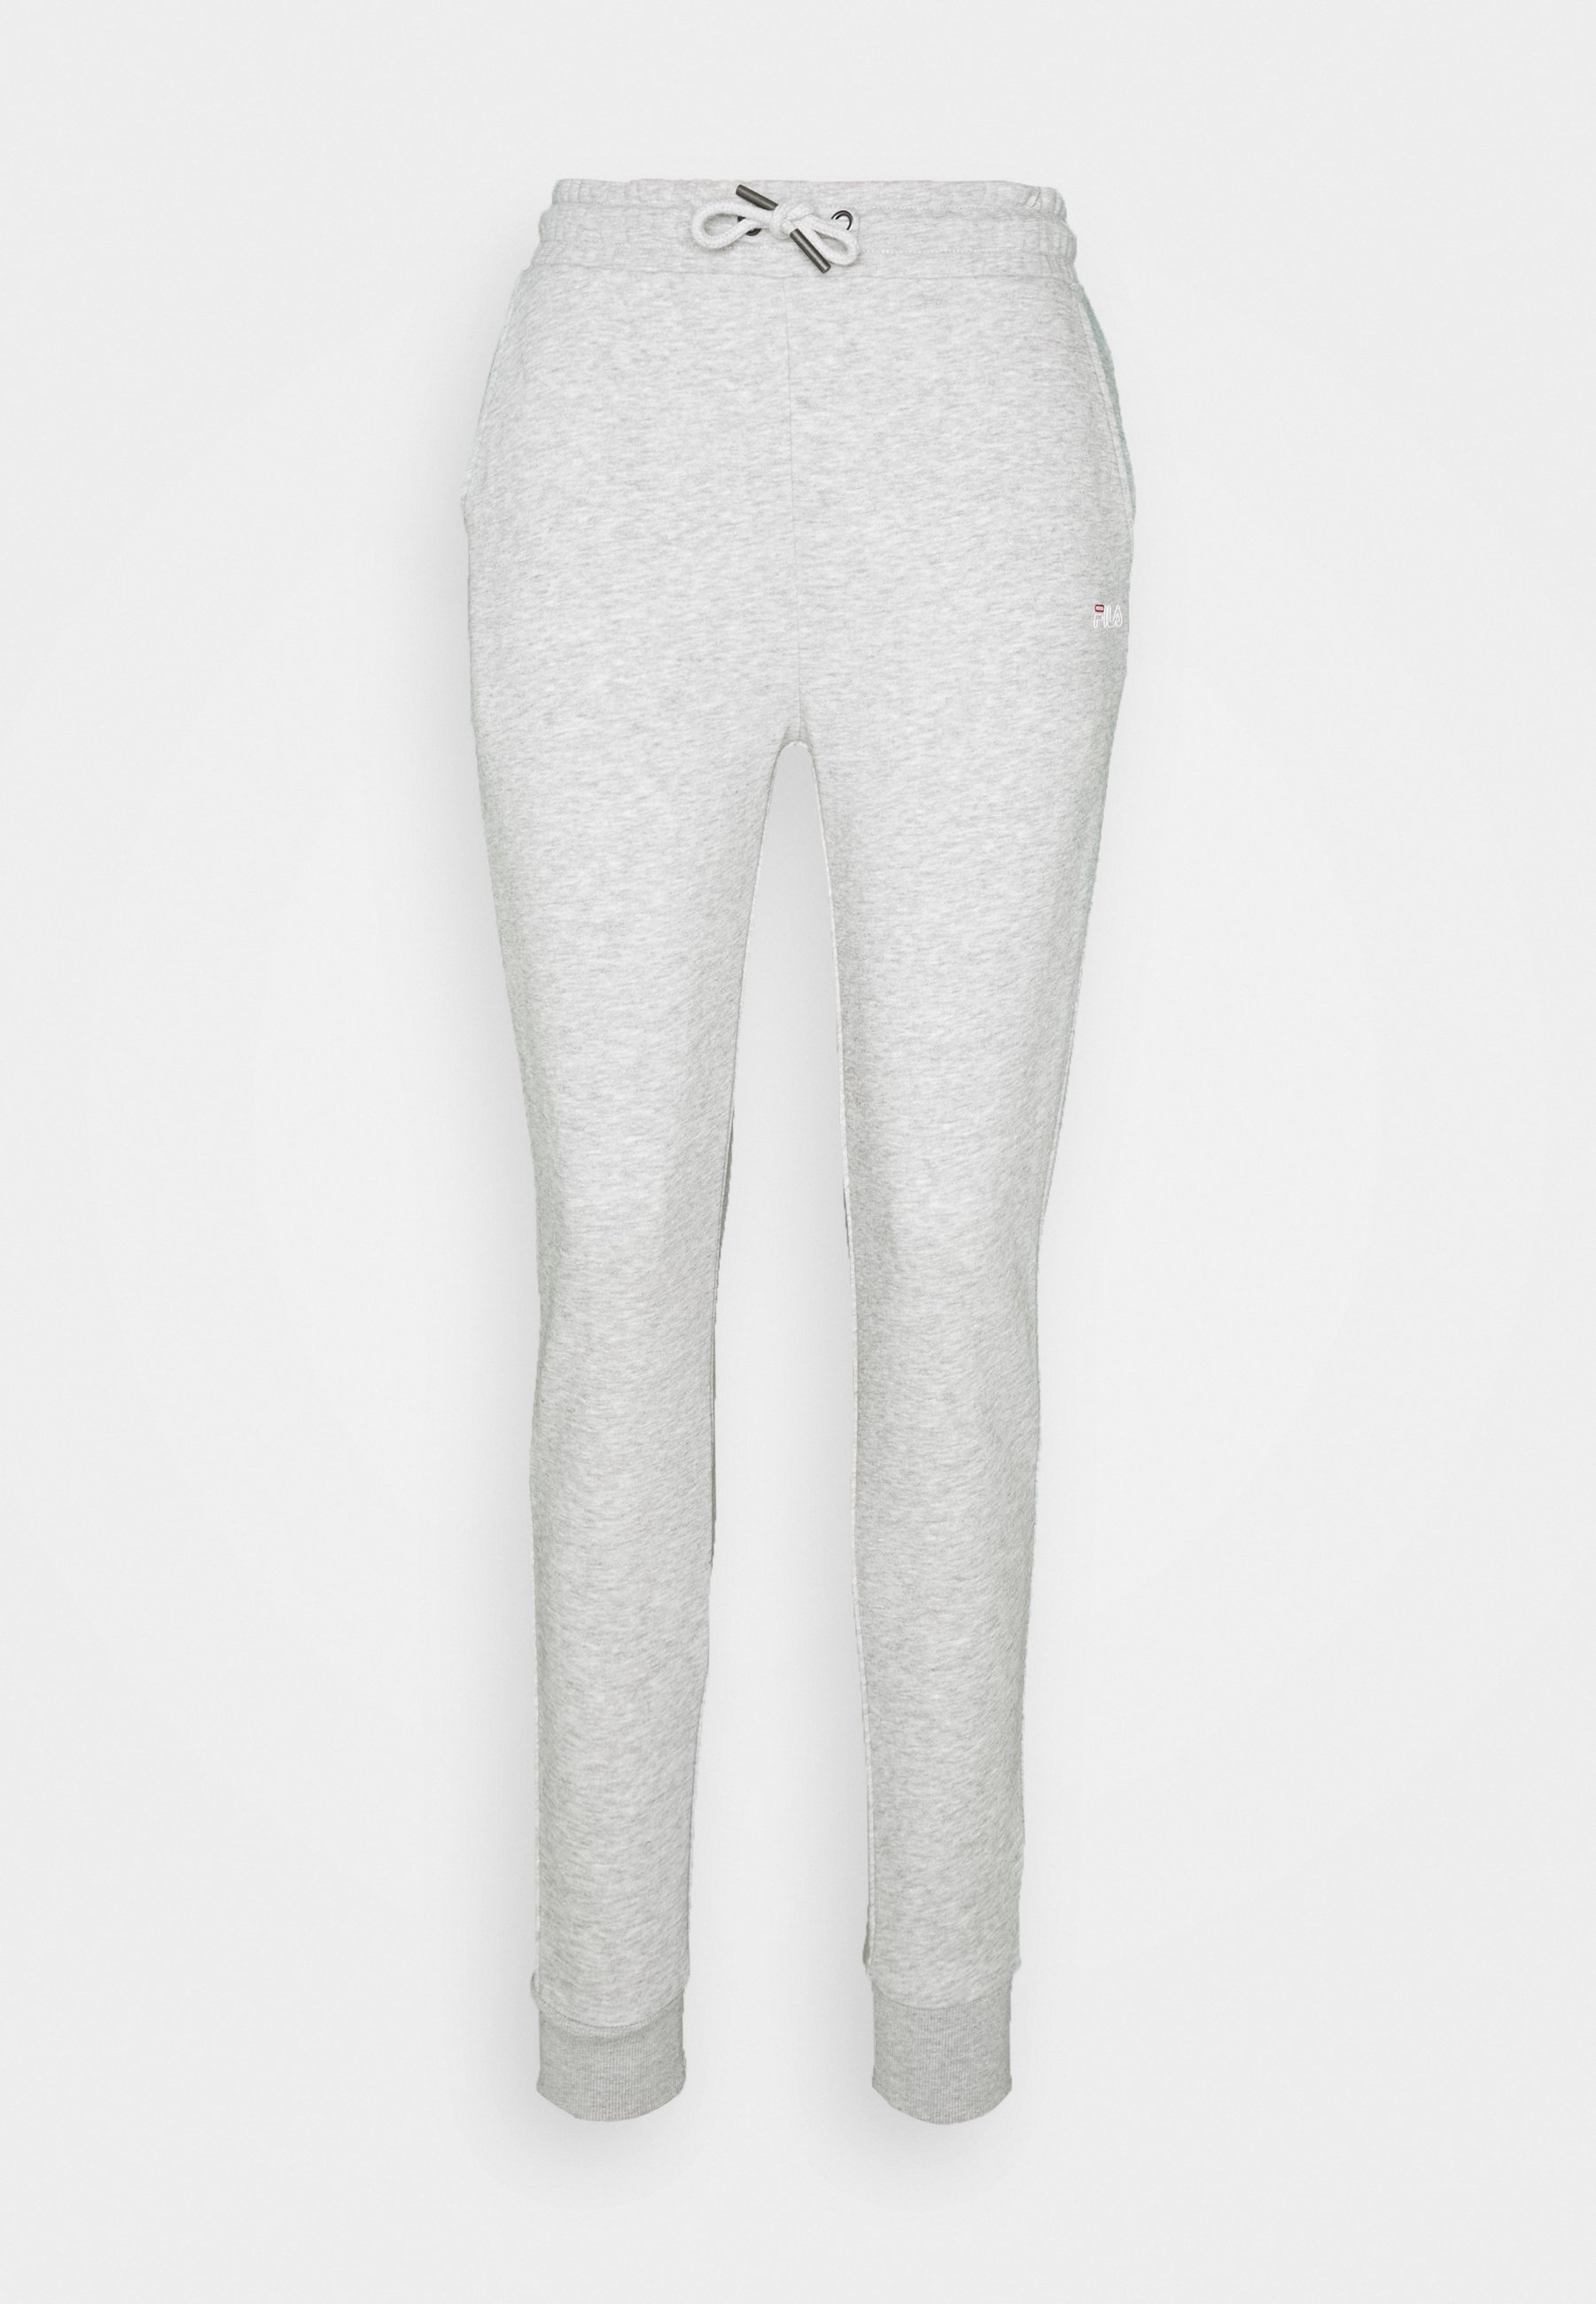 Fila Bukser   Damer   Find dine nye bukser online hos Zalando